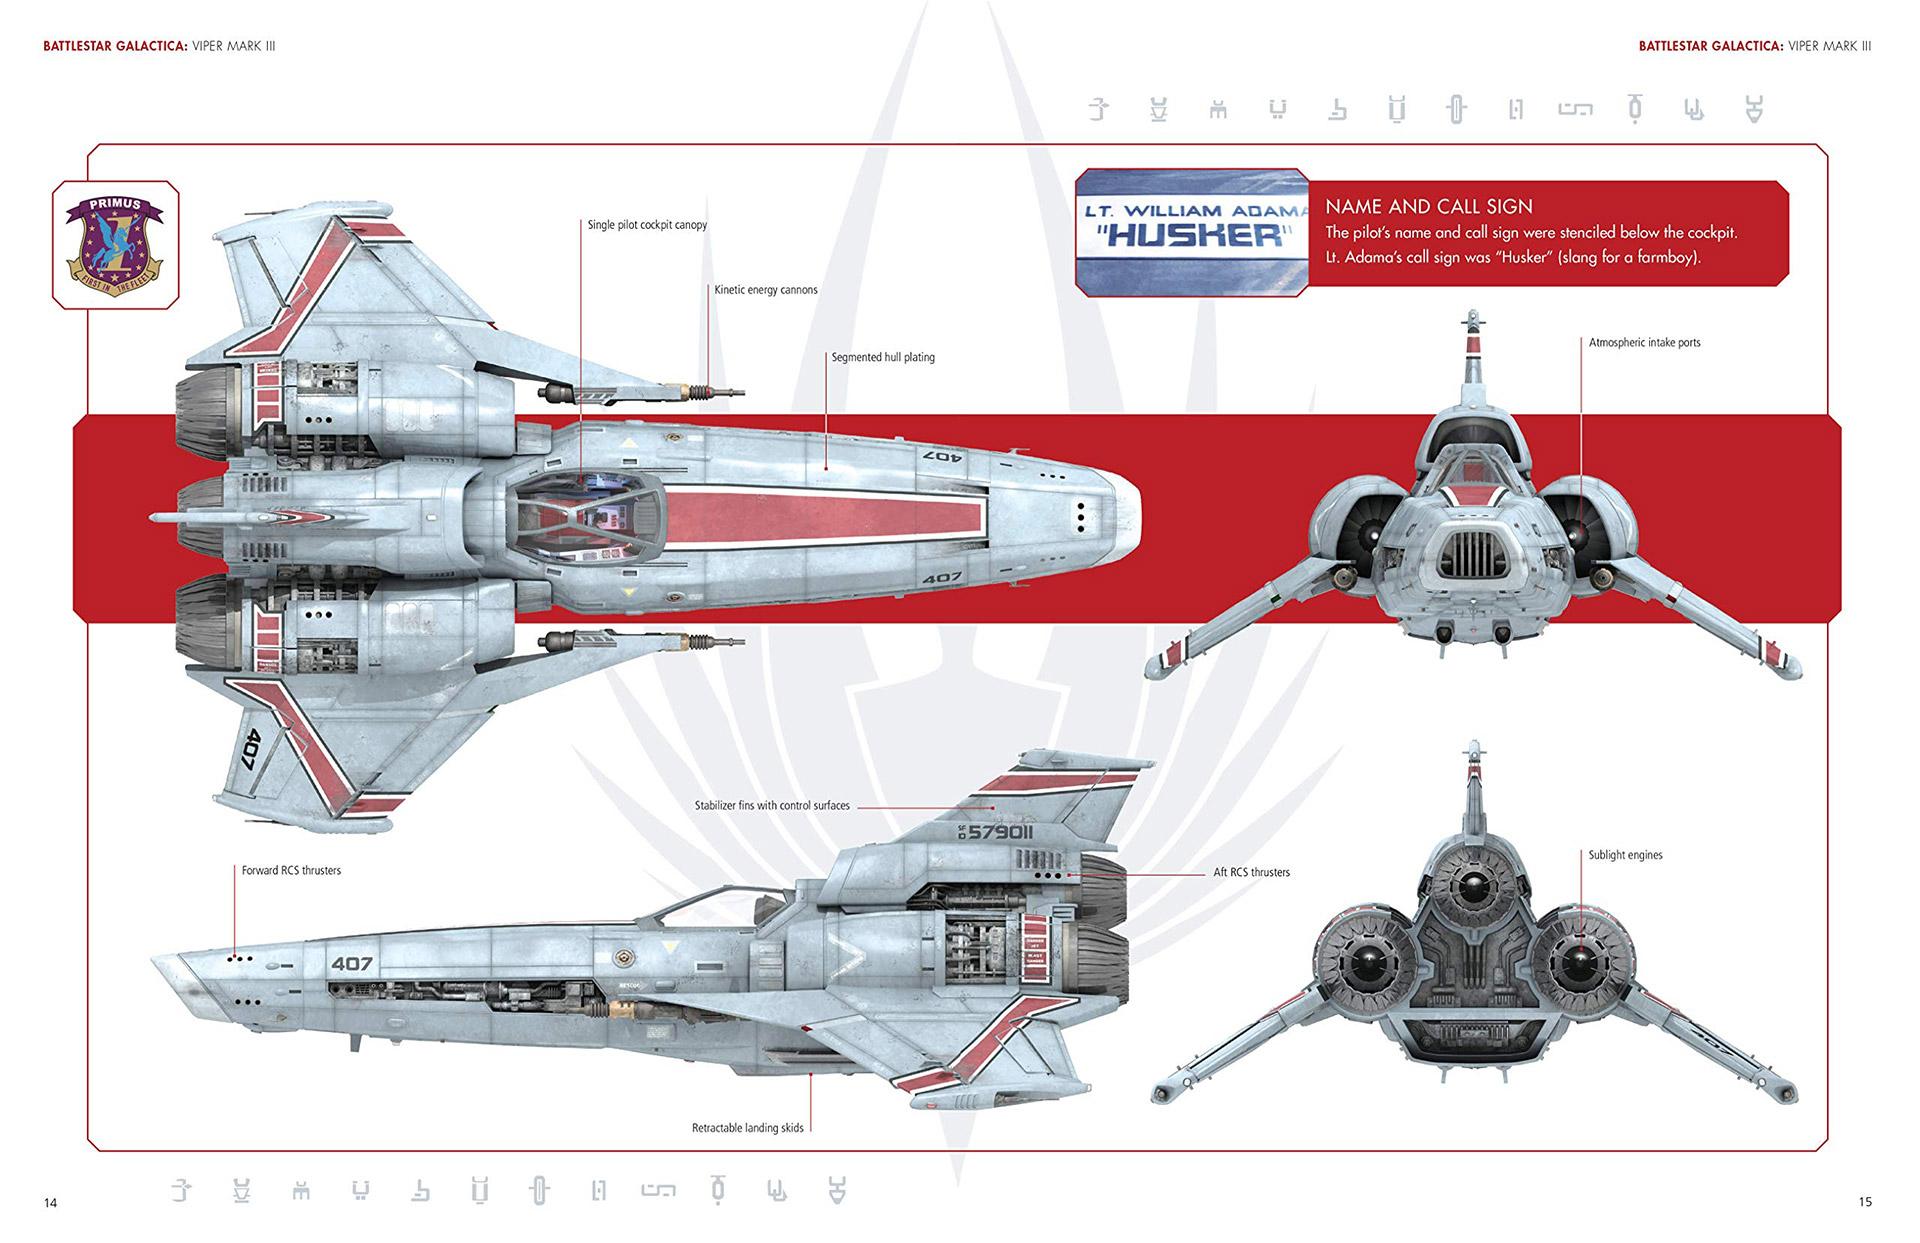 Battlestar Galactica Shipyards Book